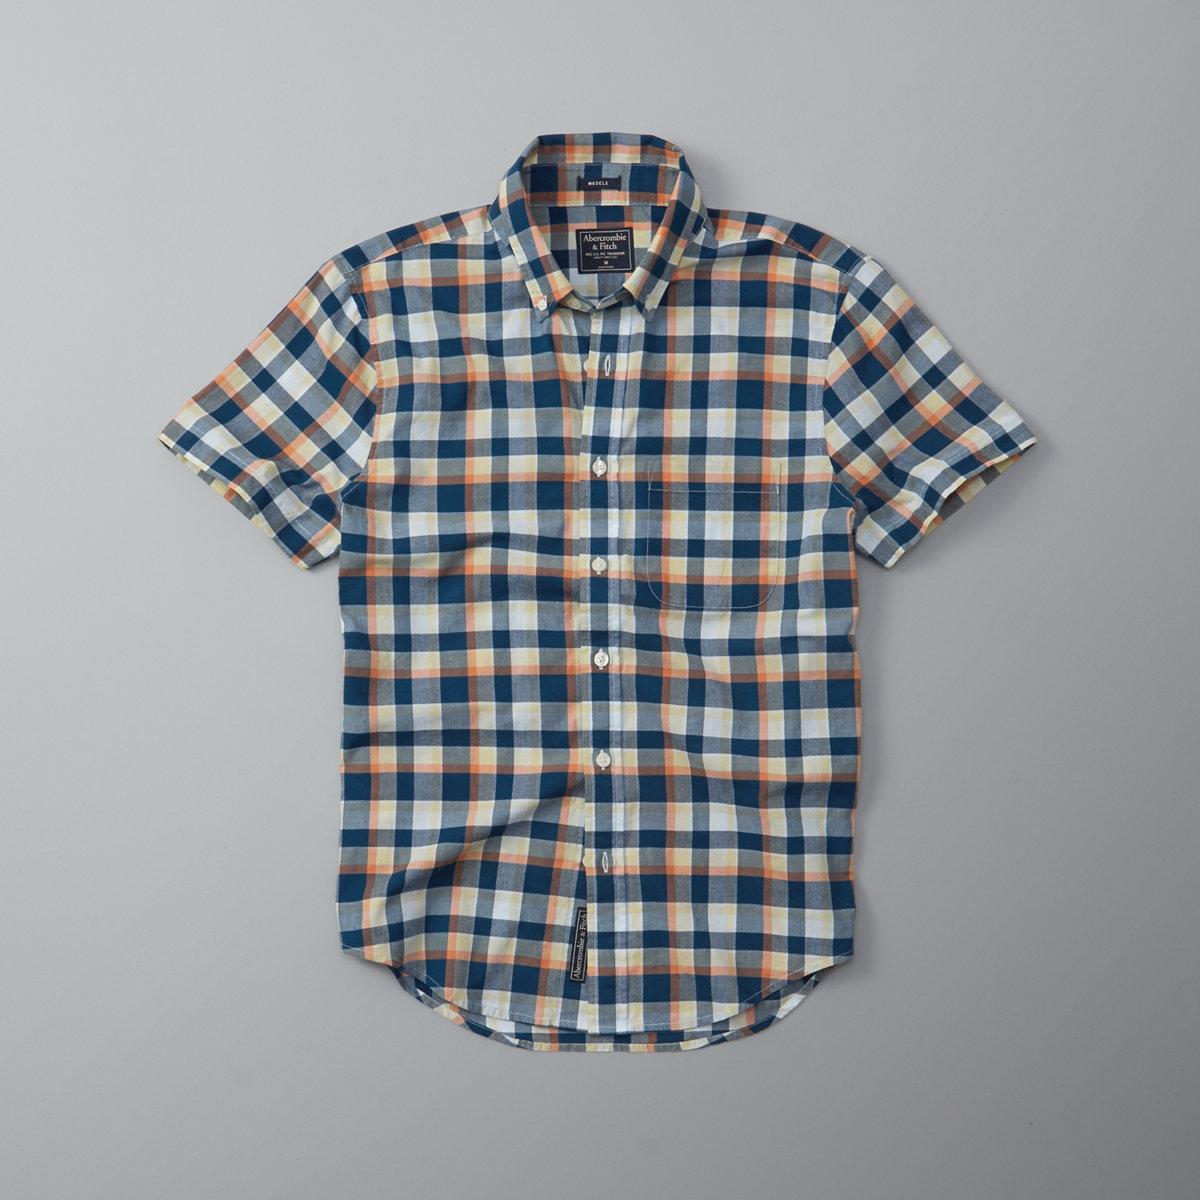 Plaid Madras Short Sleeve Shirt